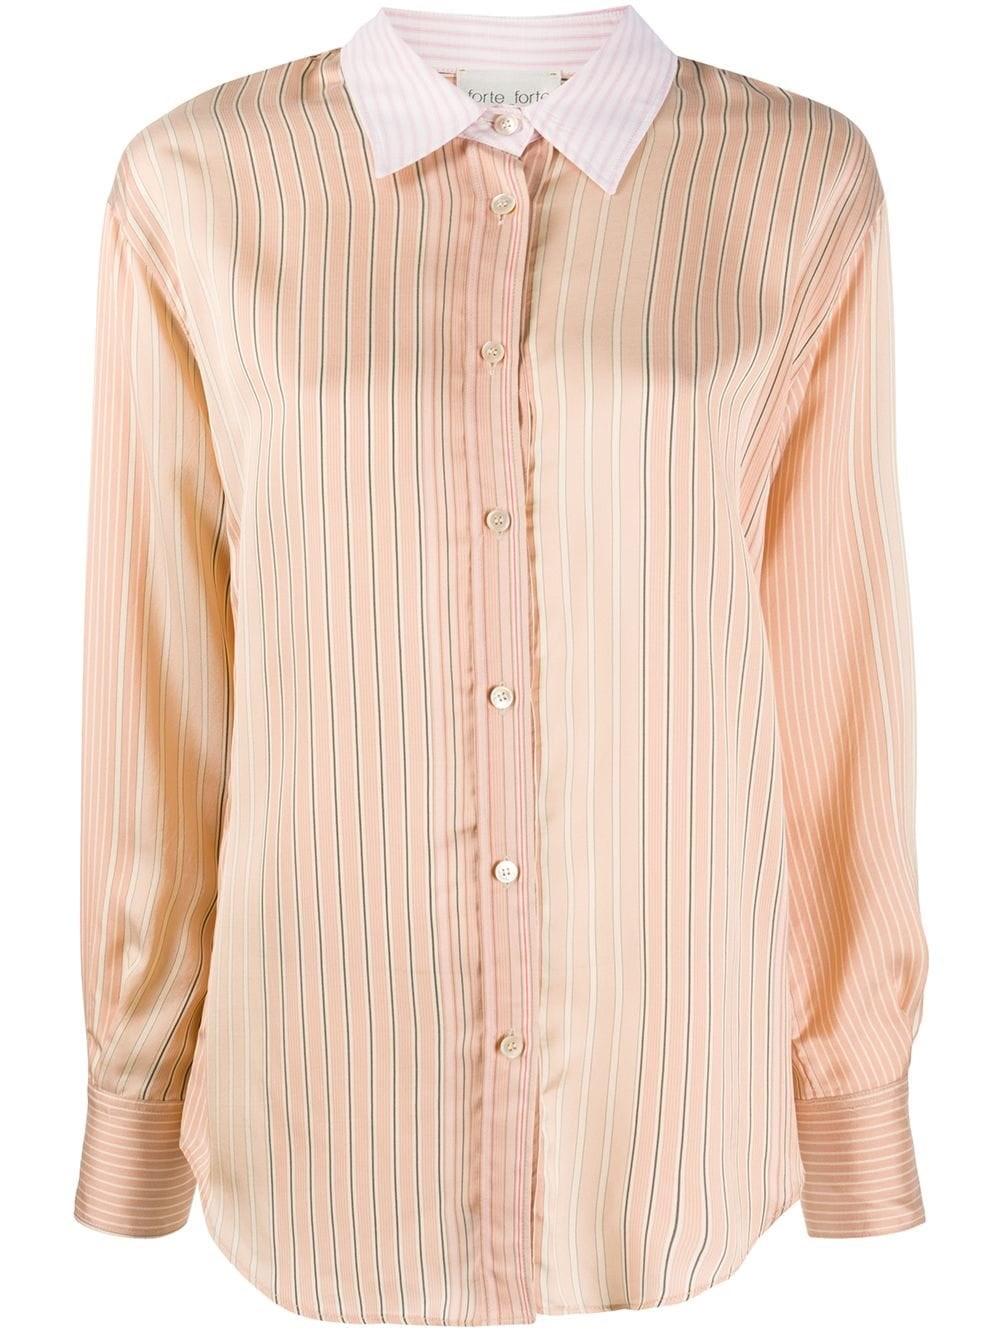 FORTE_FORTE Striped Contrasting Collar Shirt